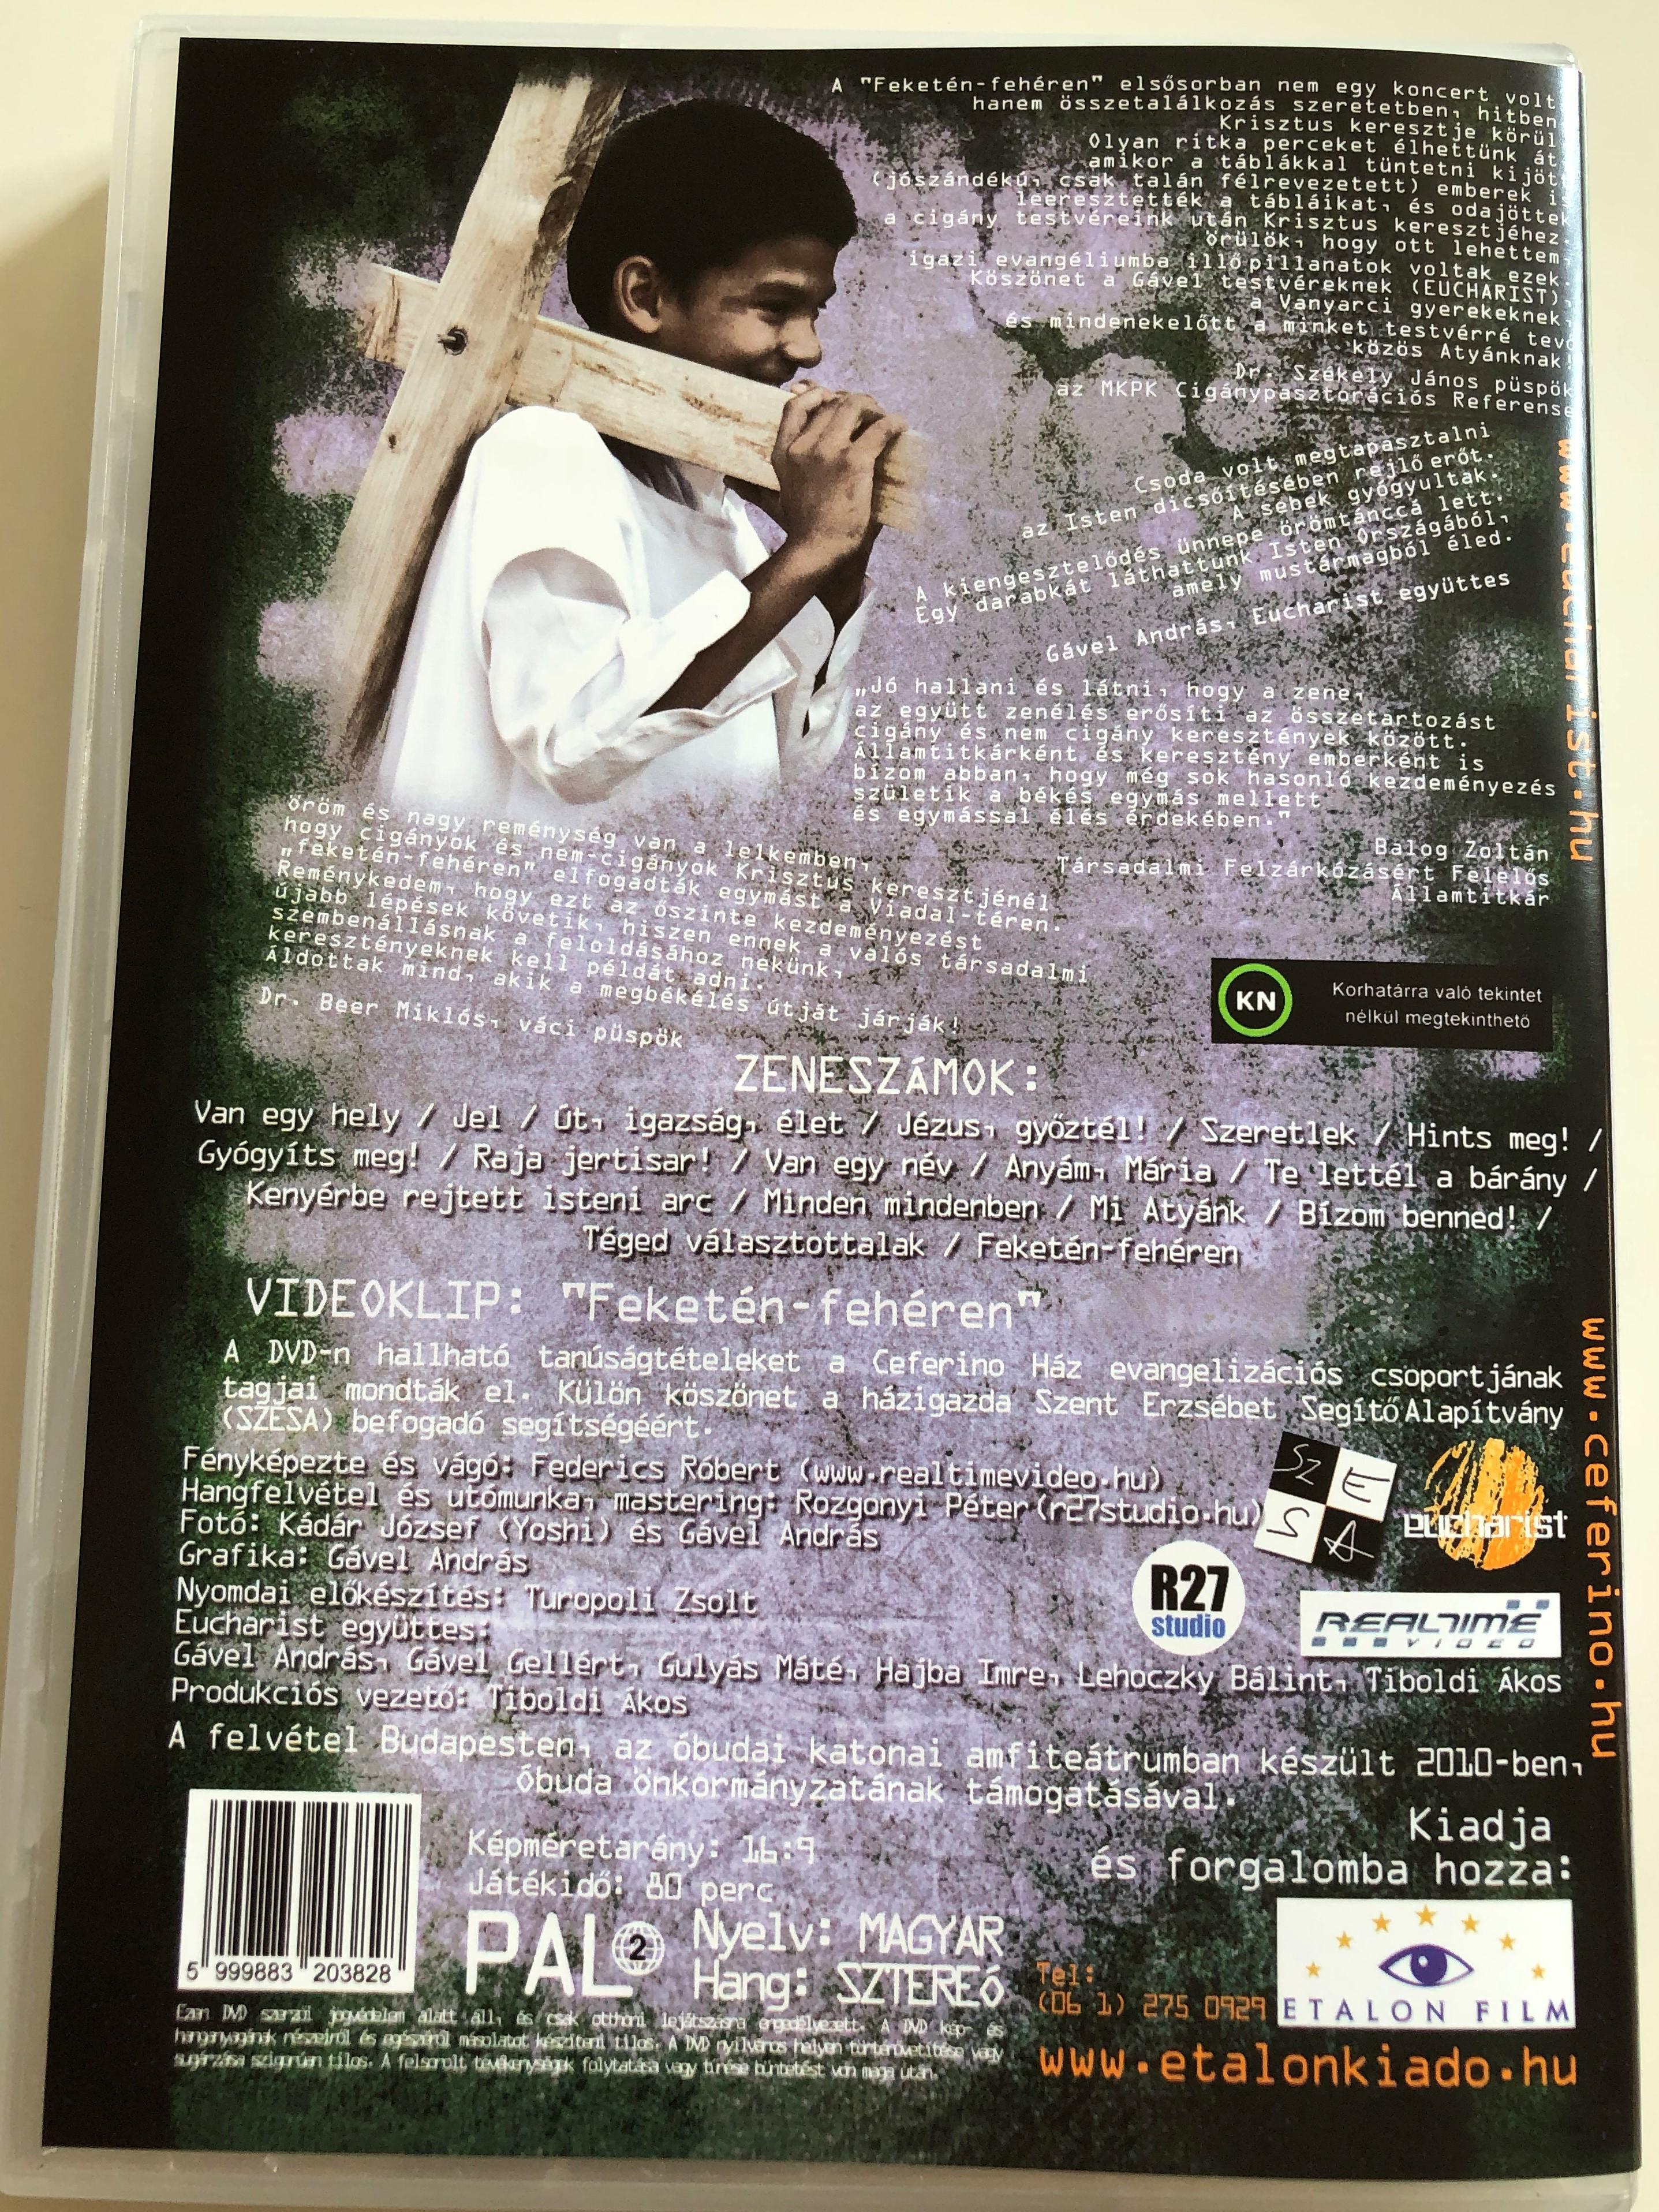 feket-n-feh-ren-dvd-2010-cig-nyok-s-nem-cig-nyok-egys-gben-j-zussal-eucharist-dics-t-koncert-2010-etalon-film-hungarian-praise-and-worship-concert-dvd-3-.jpg